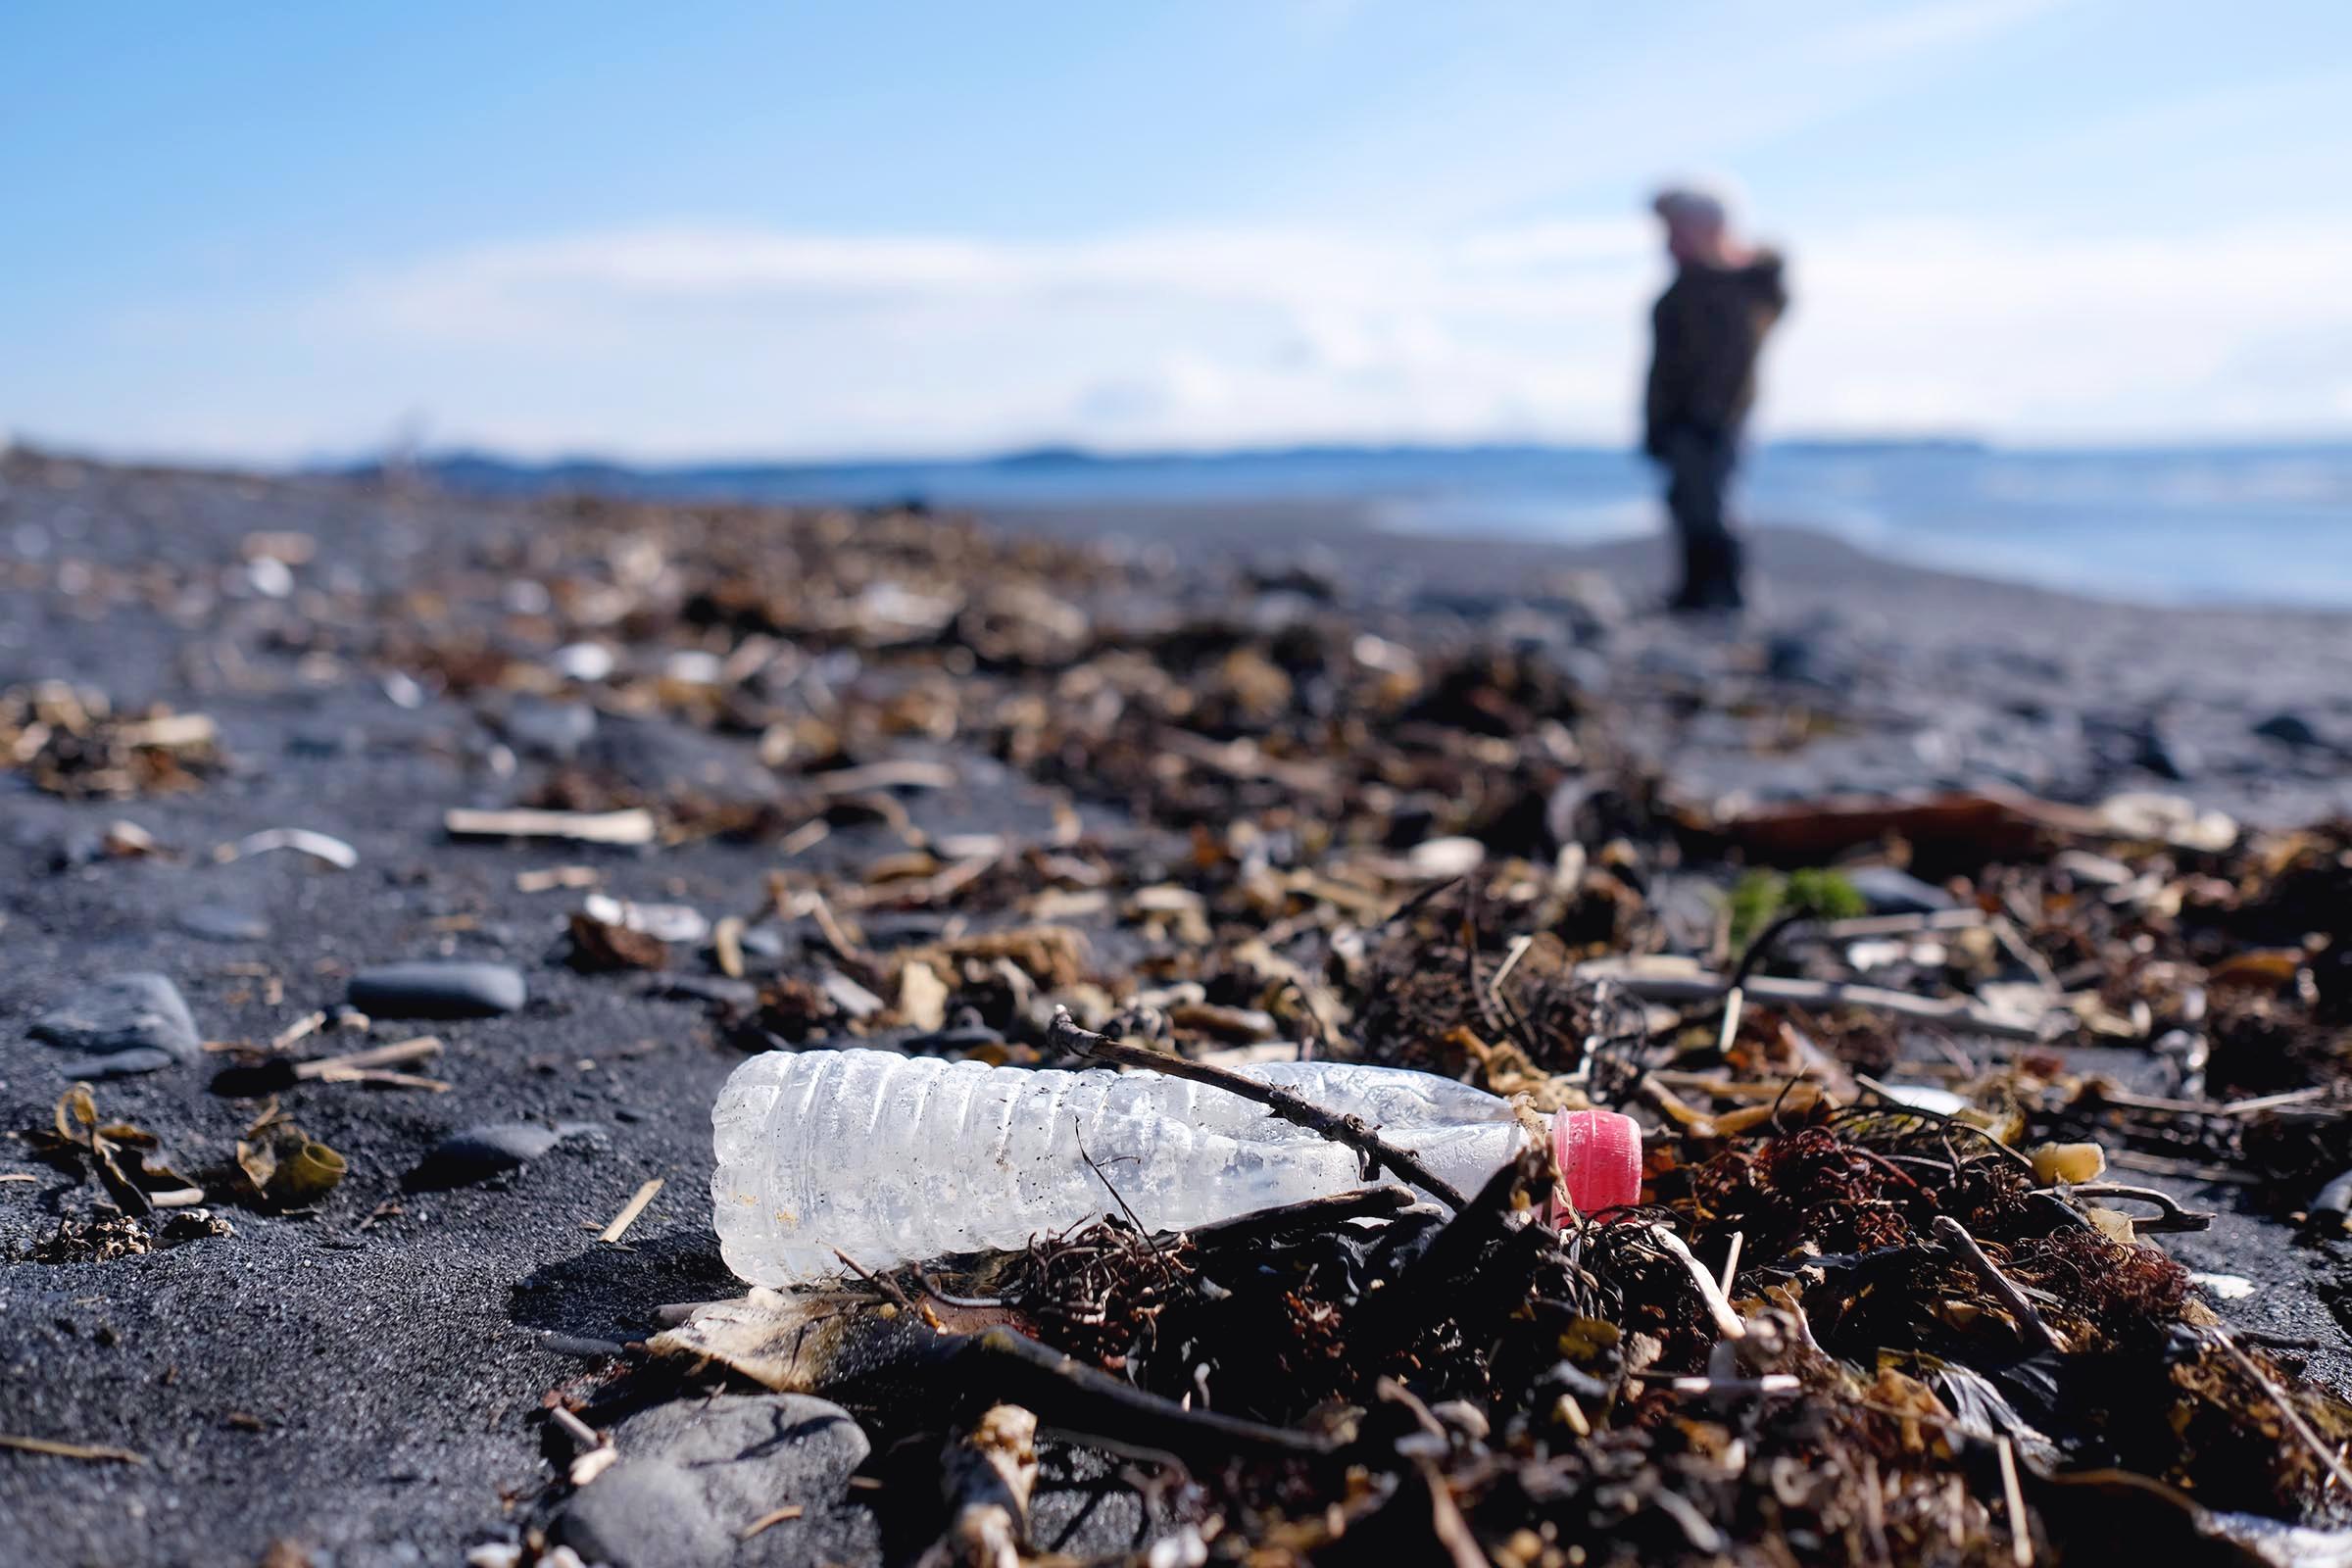 Earth Day 2019 Beach Clean Up